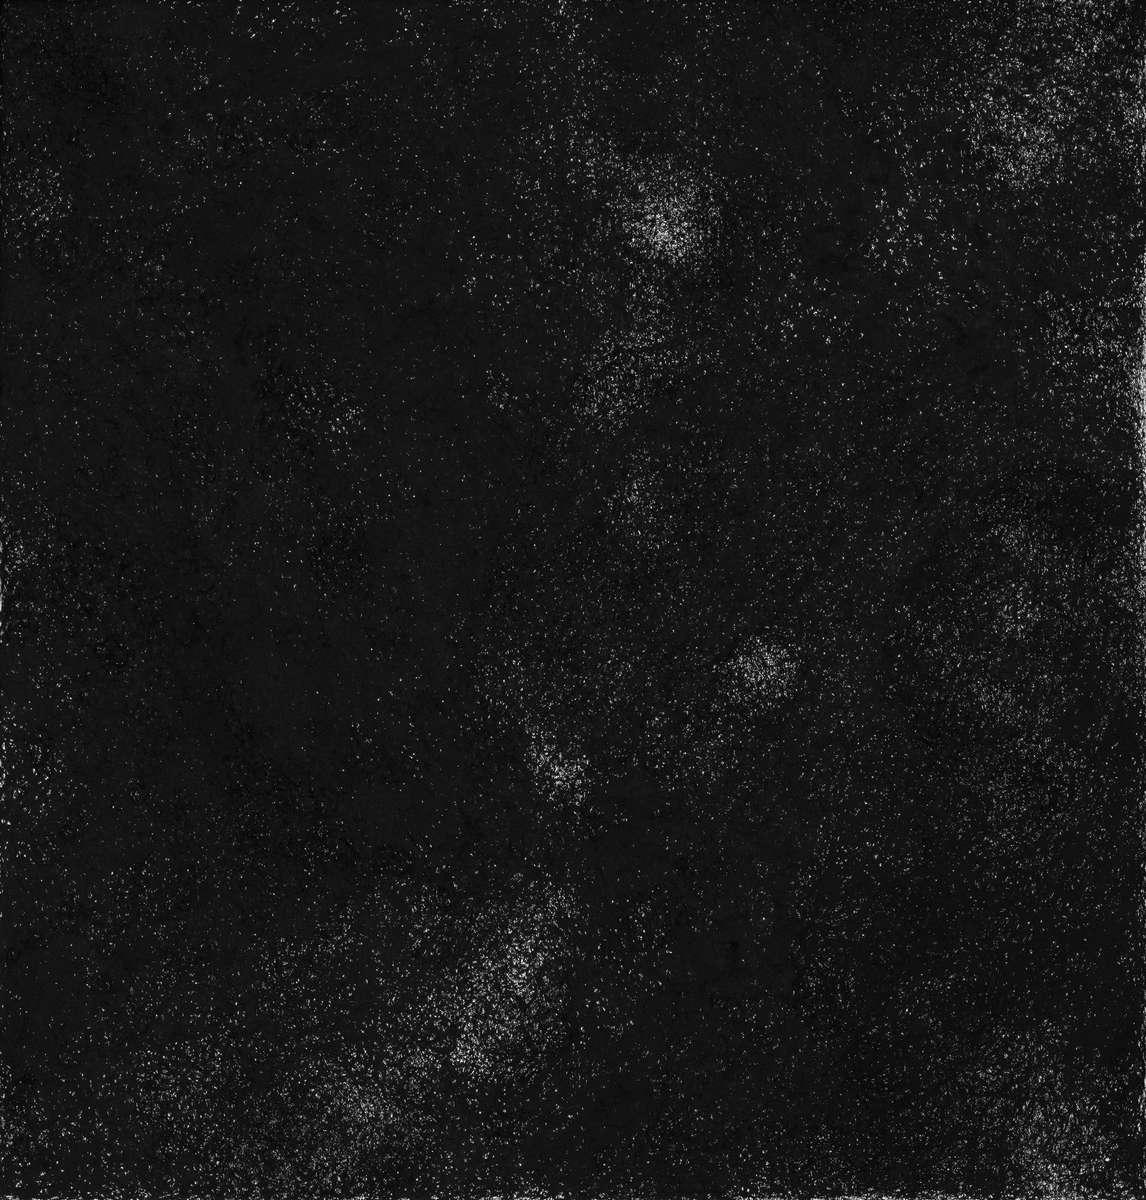 Tina Konec, Dark I